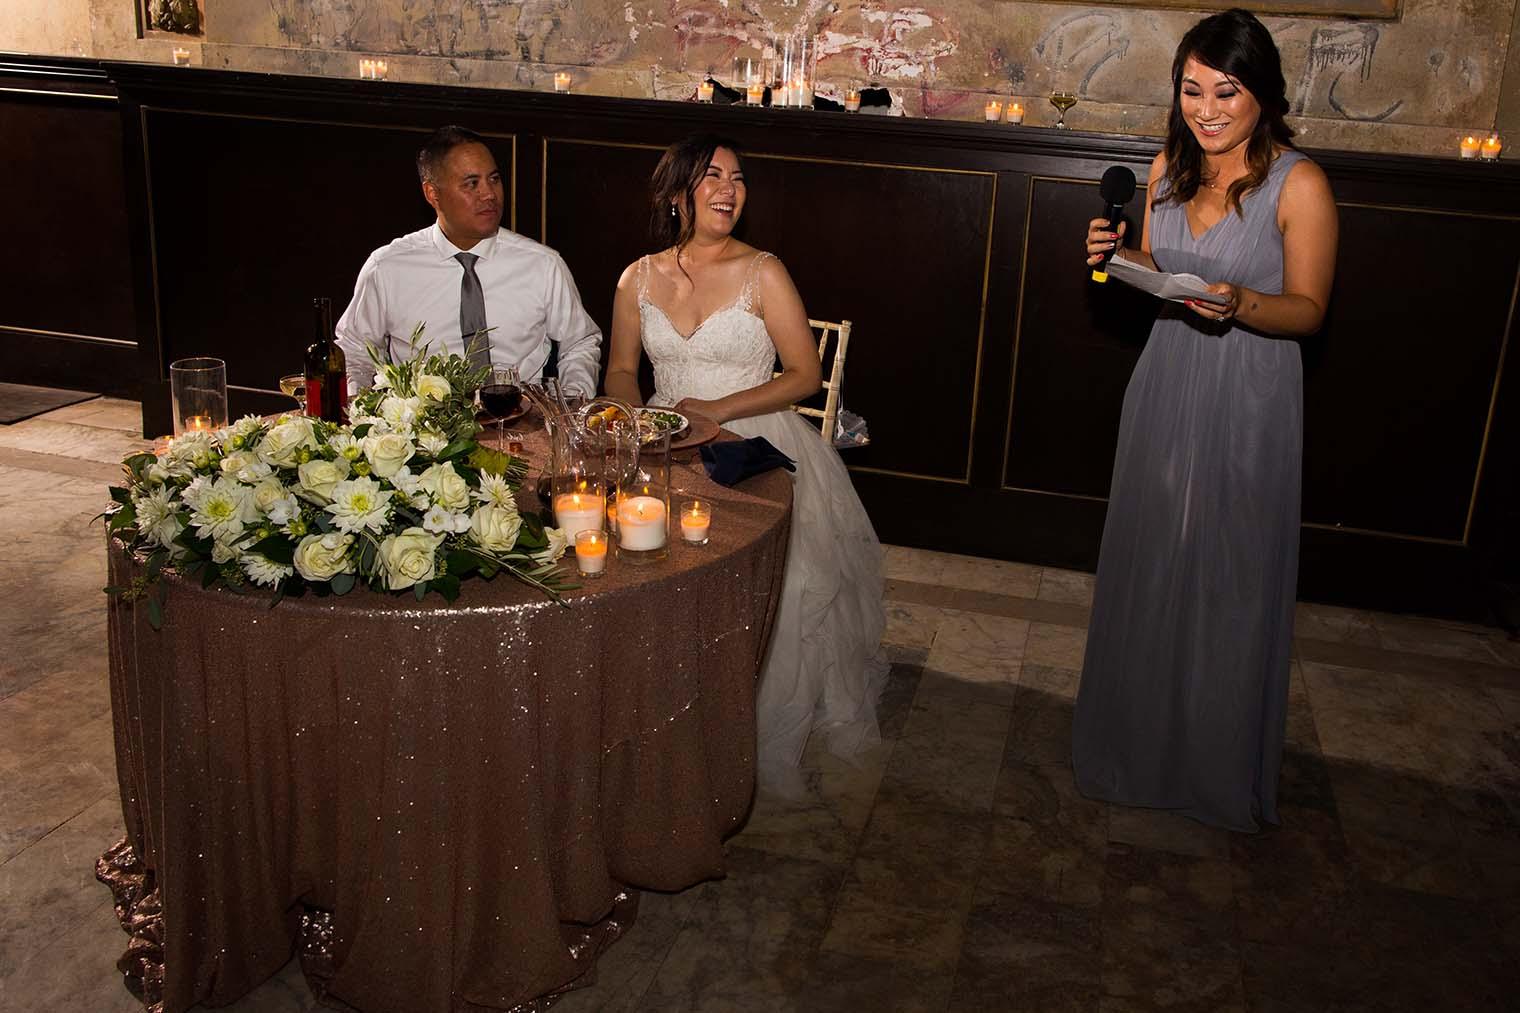 16th Street Station Wedding Toasts